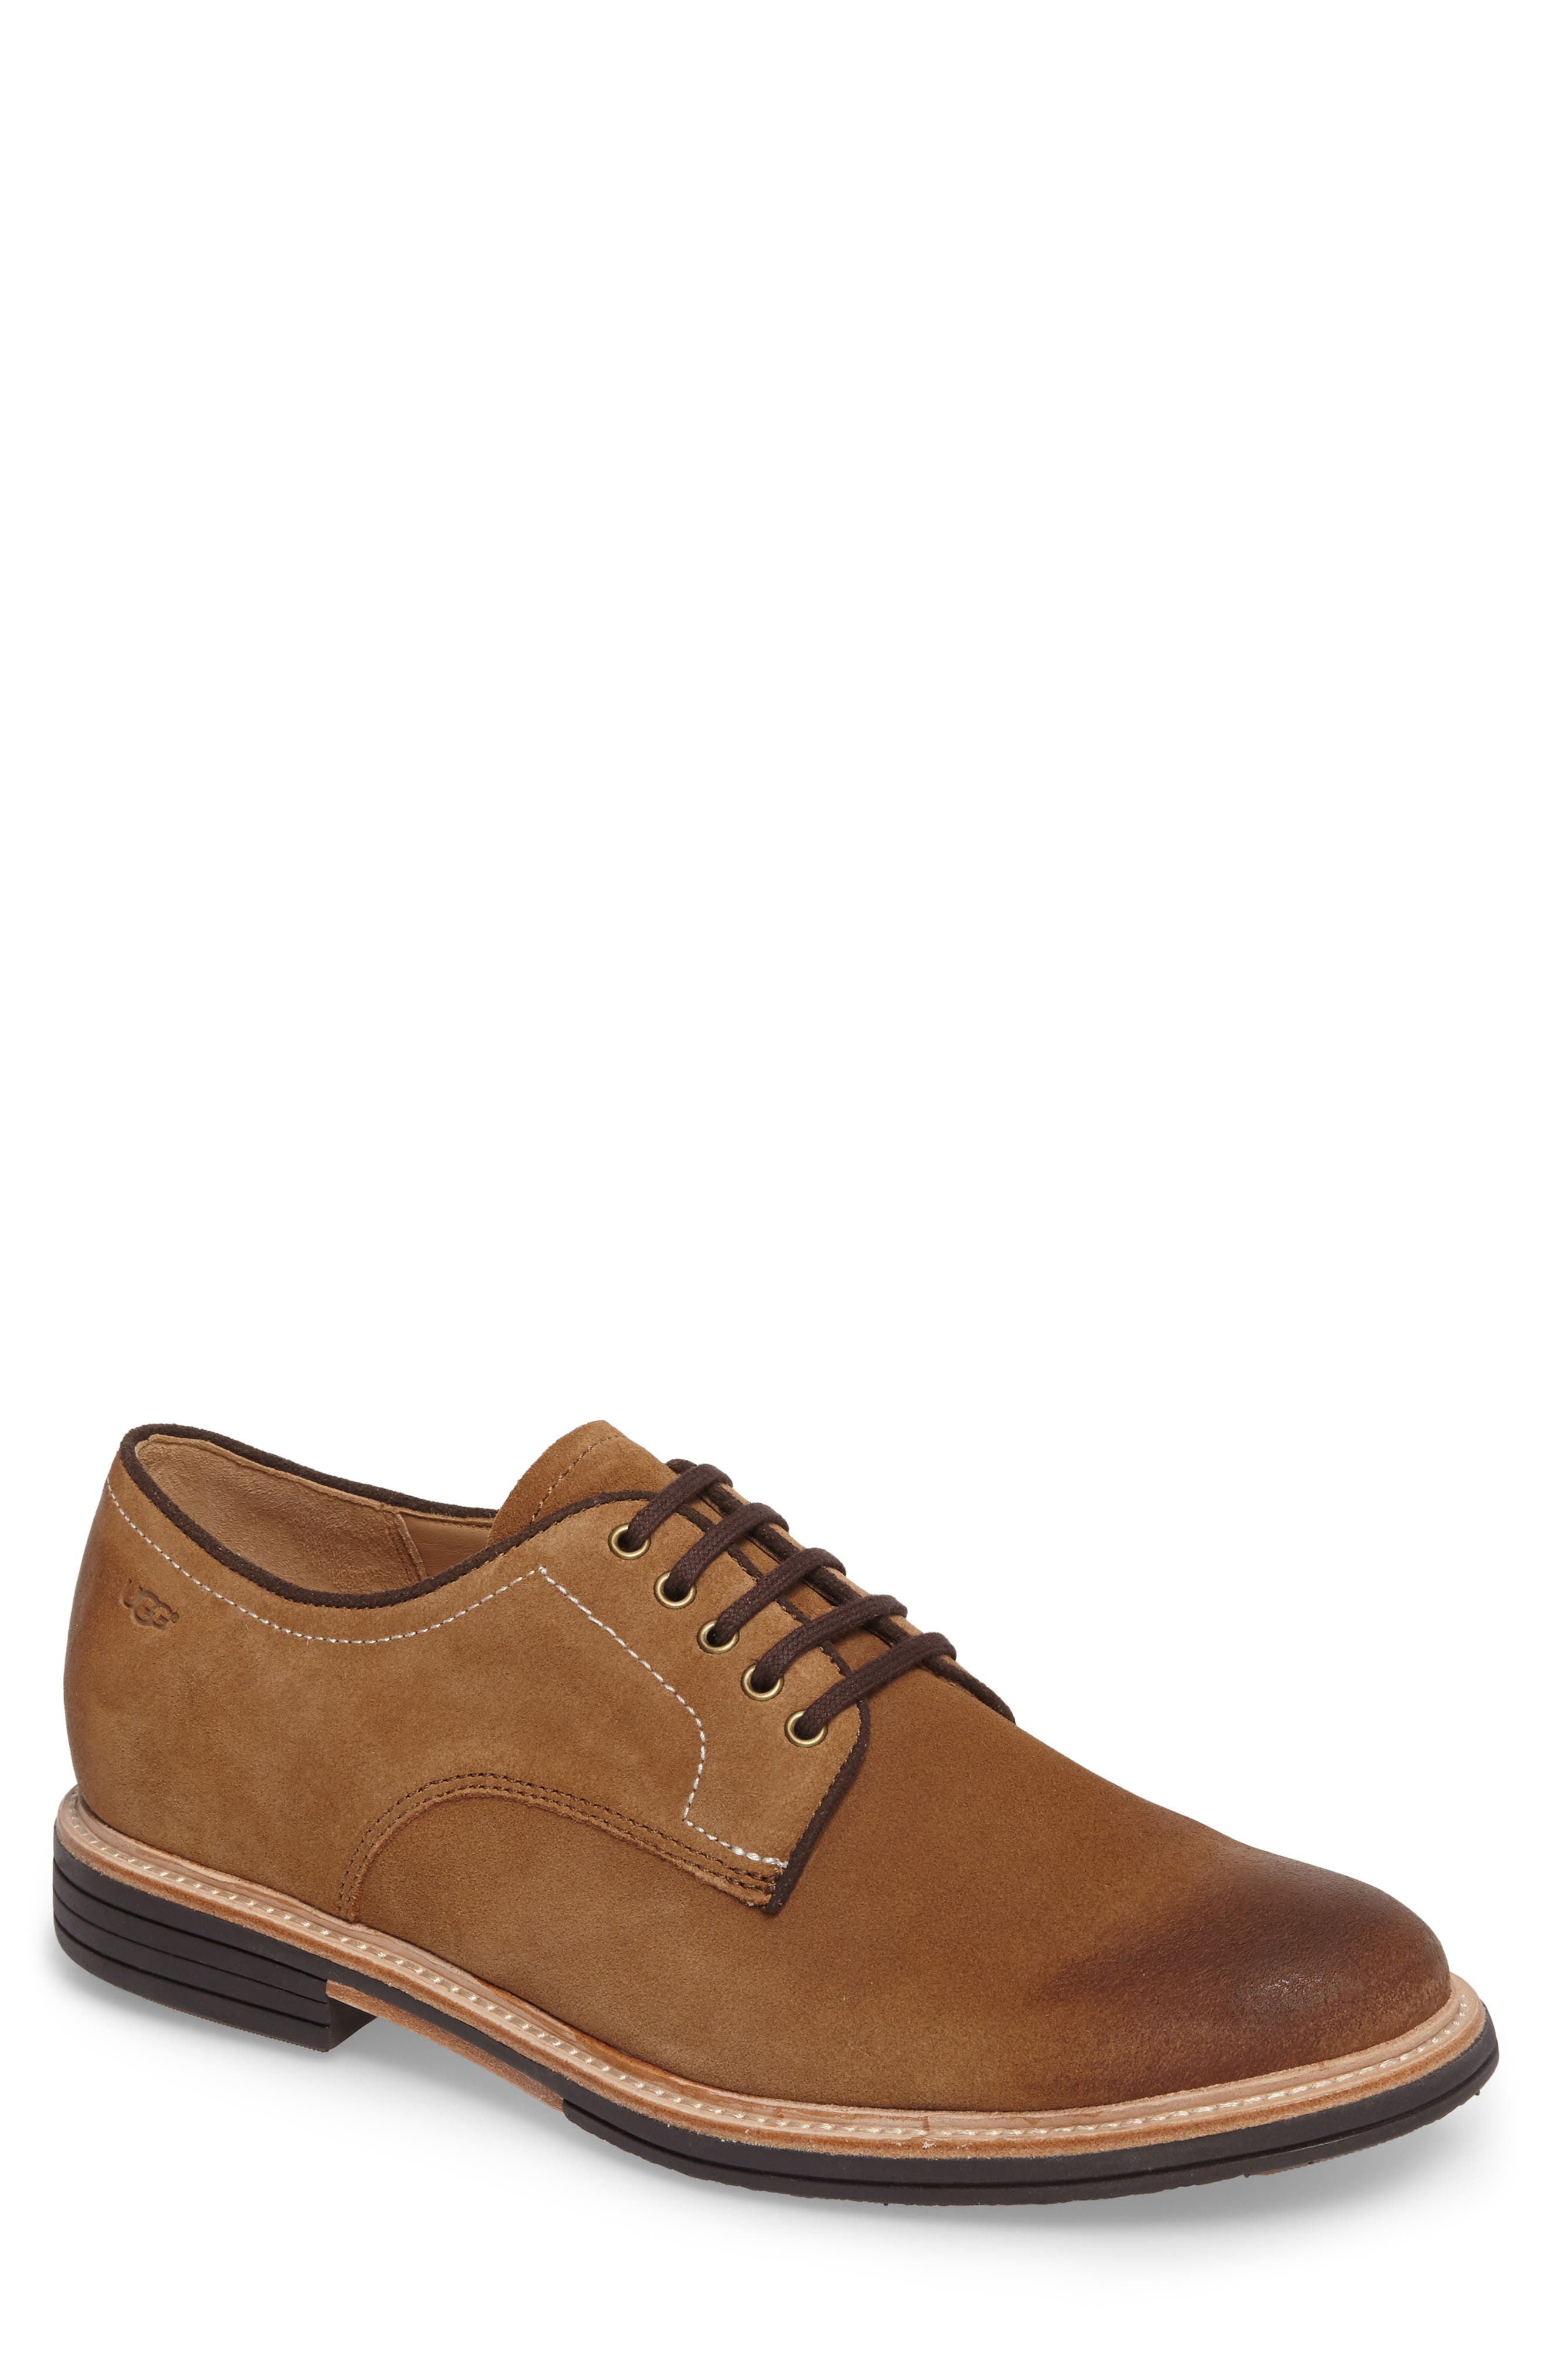 Jovin Buck Shoe,                         Main,                         color, Chestnut